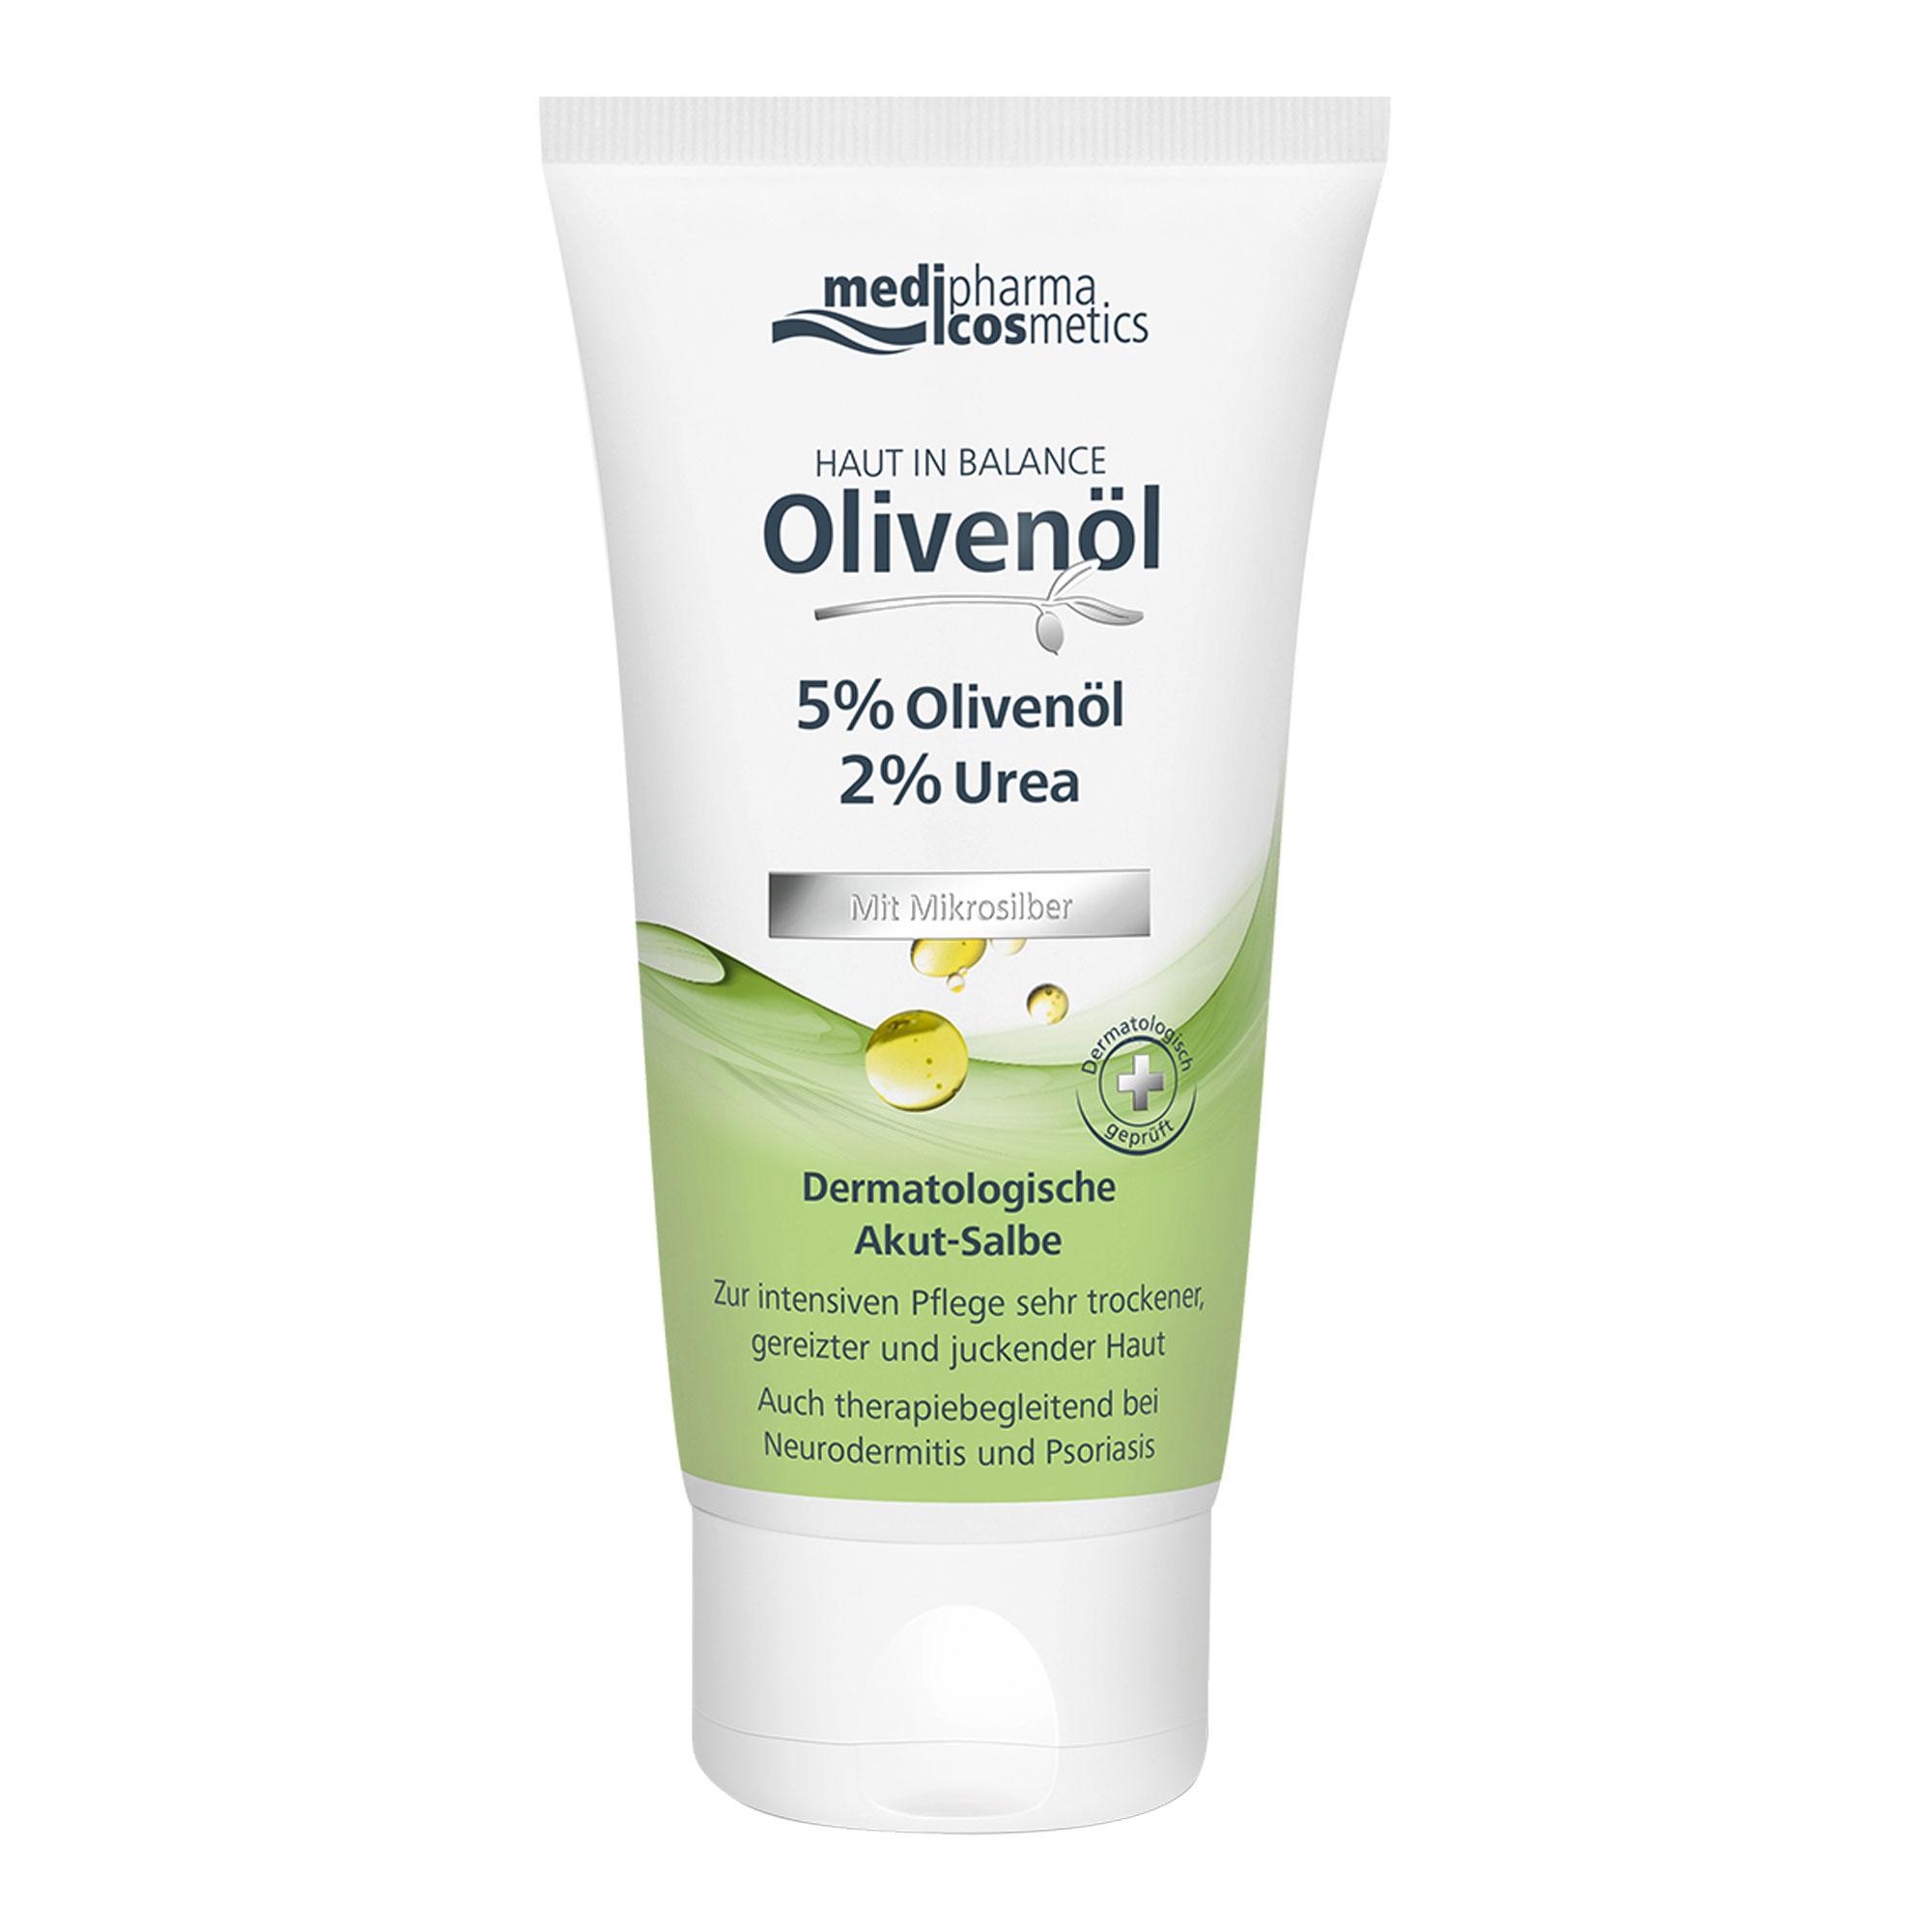 Olivenöl Haut in Balance Akut-Salbe